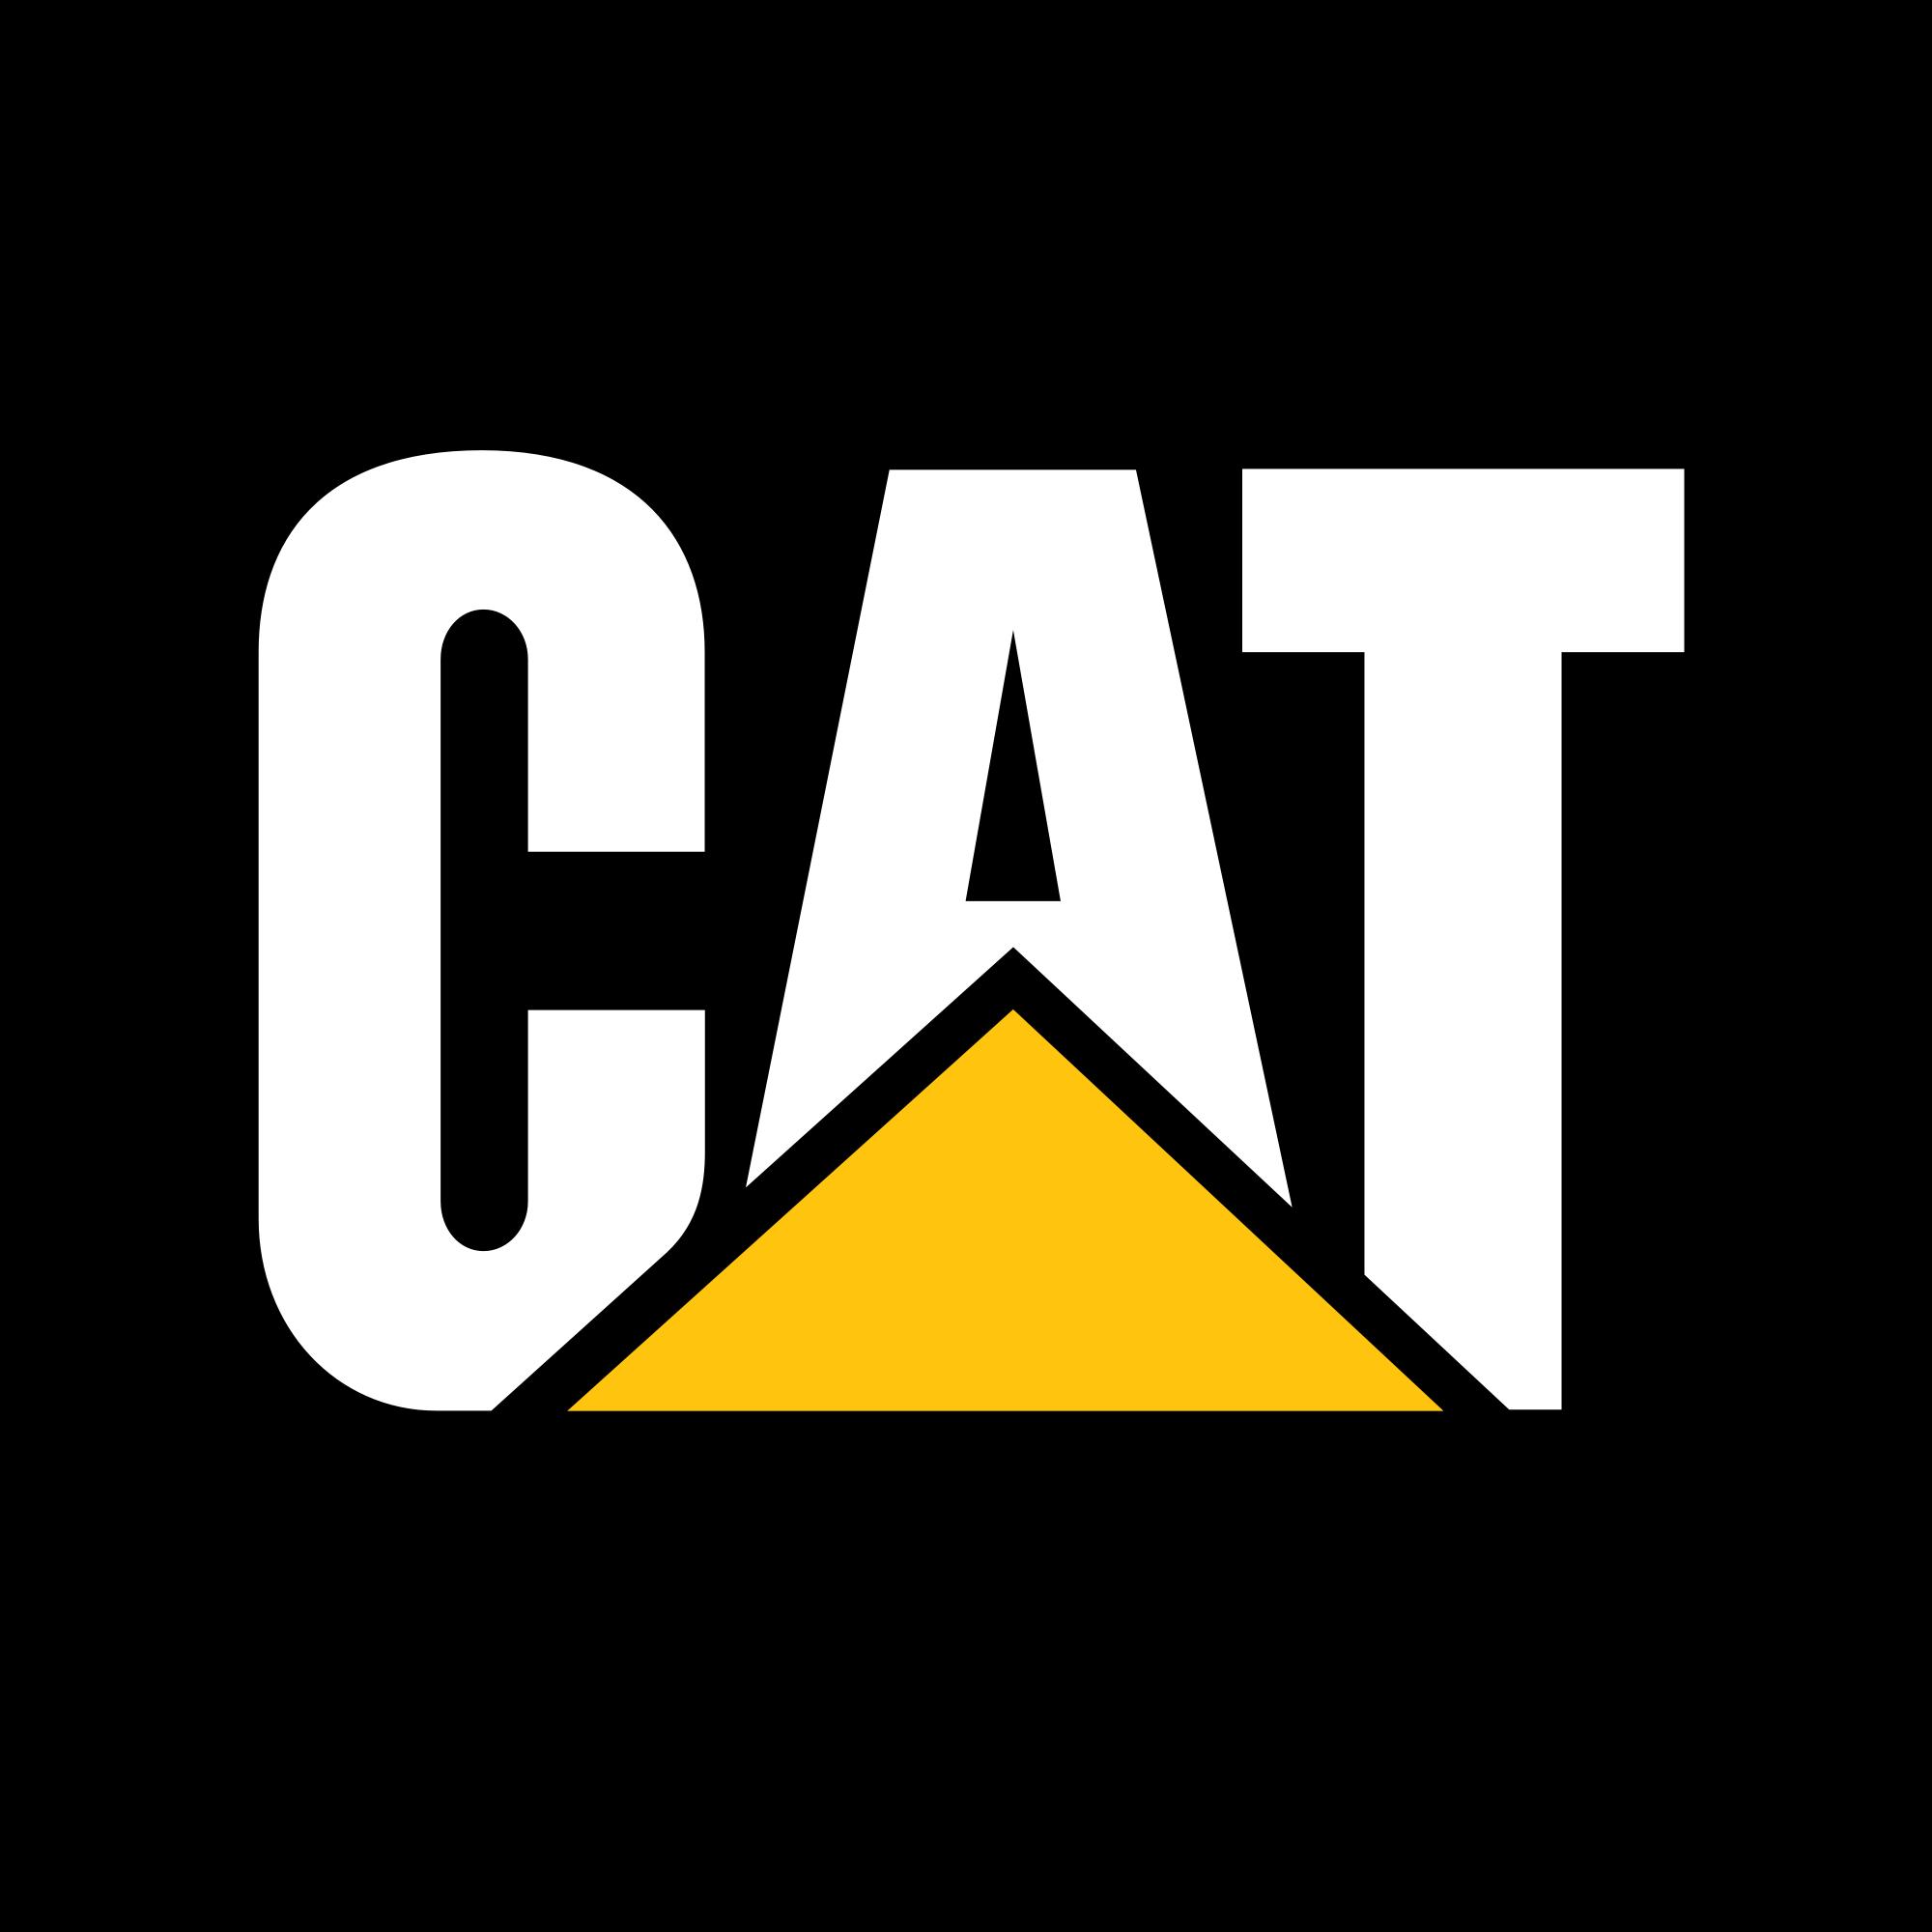 New Layoffs at Caterpillar in Decatur